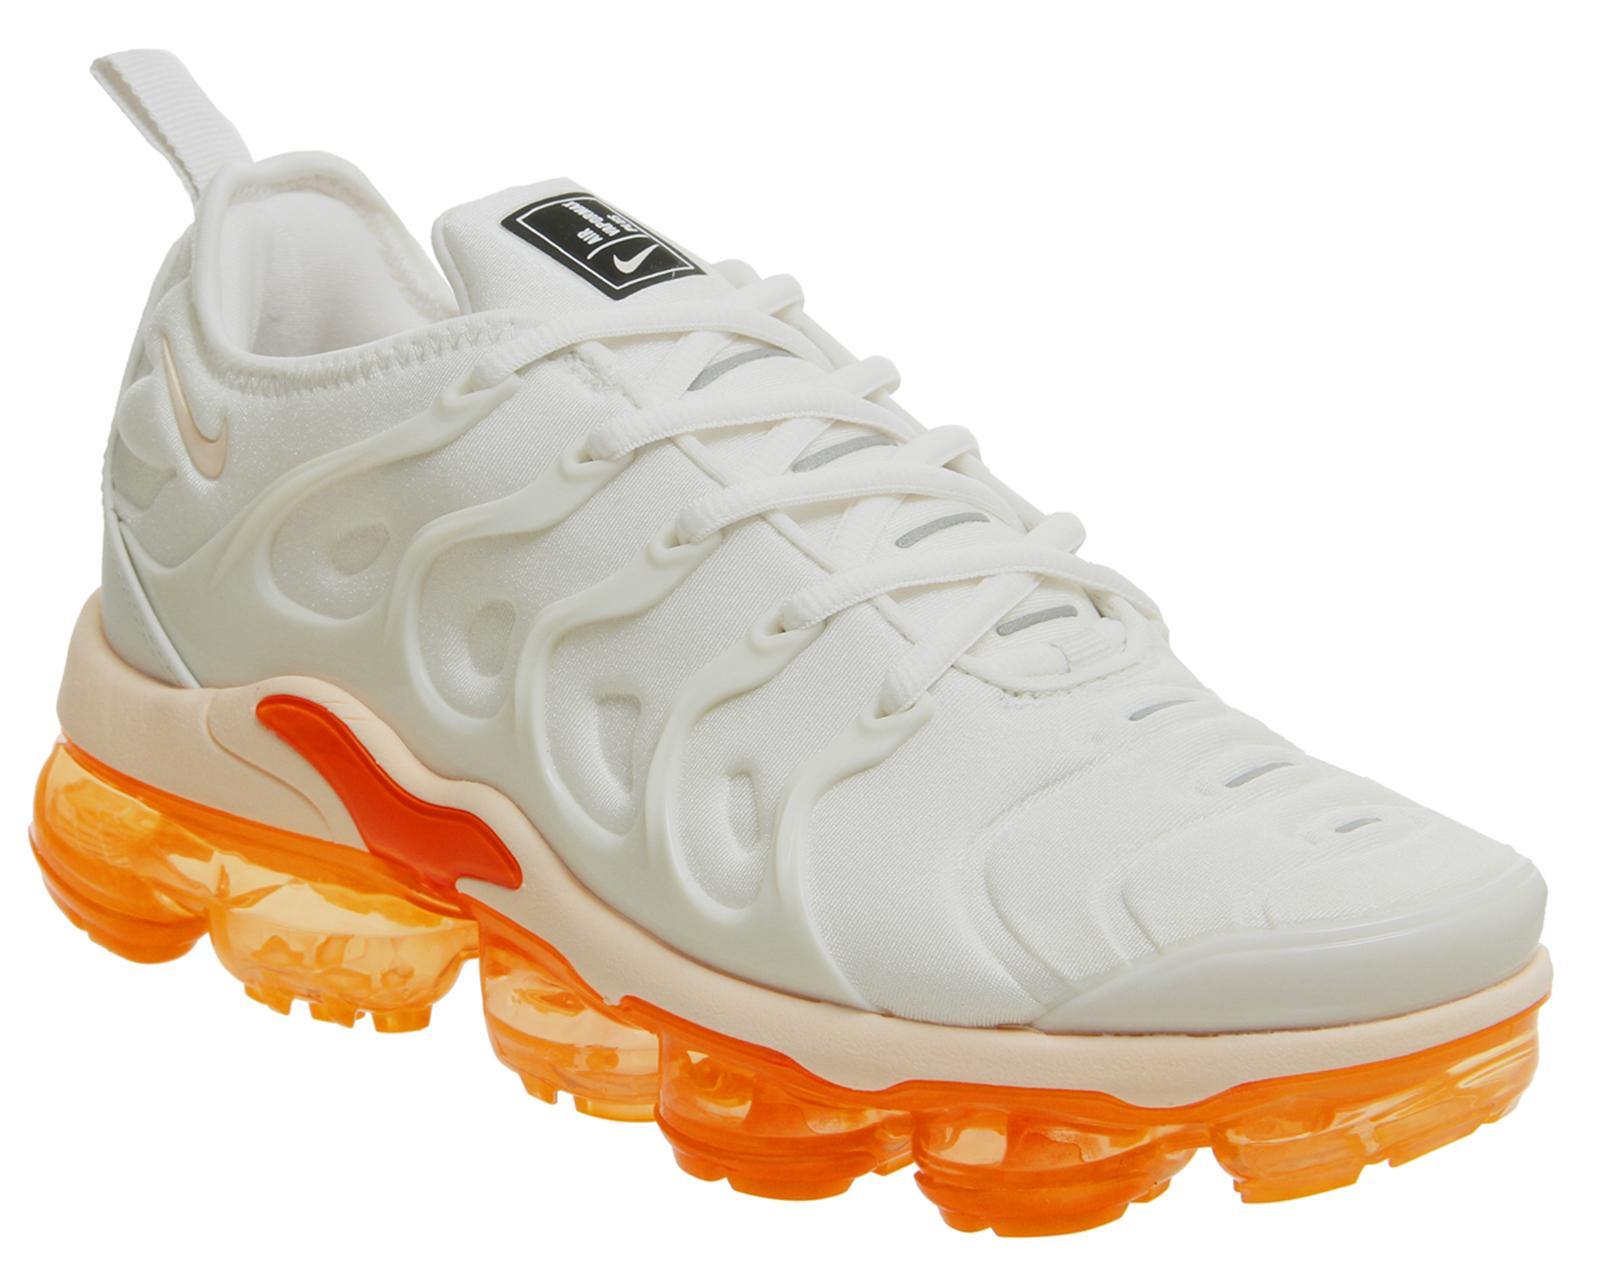 f410ff1dd71 Lyst - Nike Air Vapormax Plus Trainers